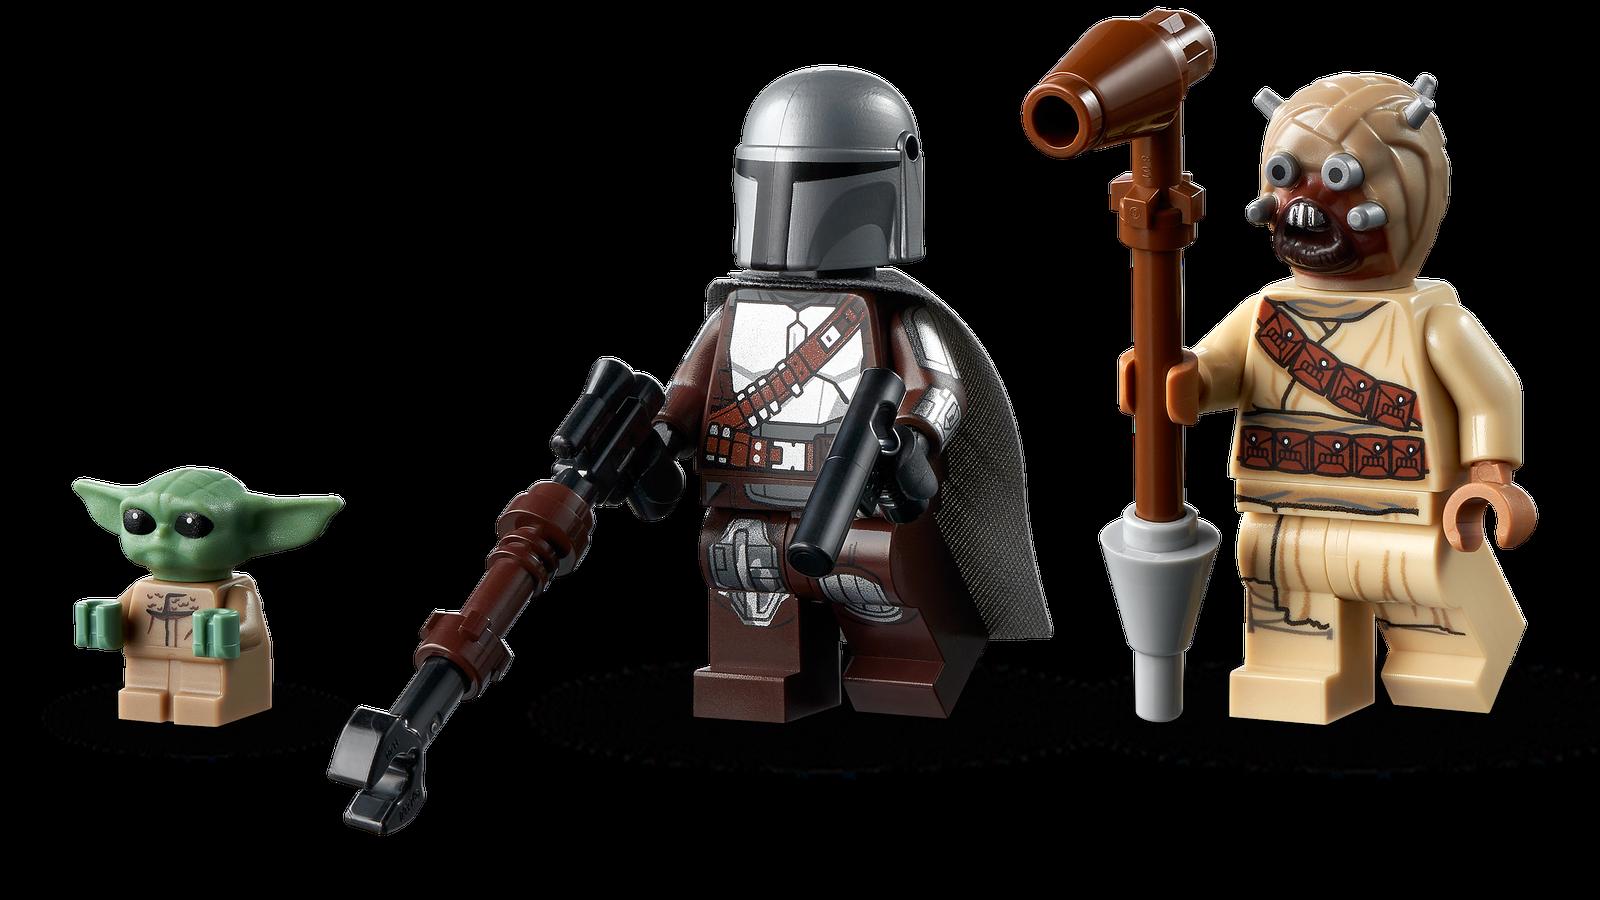 LEGO Star Wars: The Mandalorian, Trouble on Tatooine